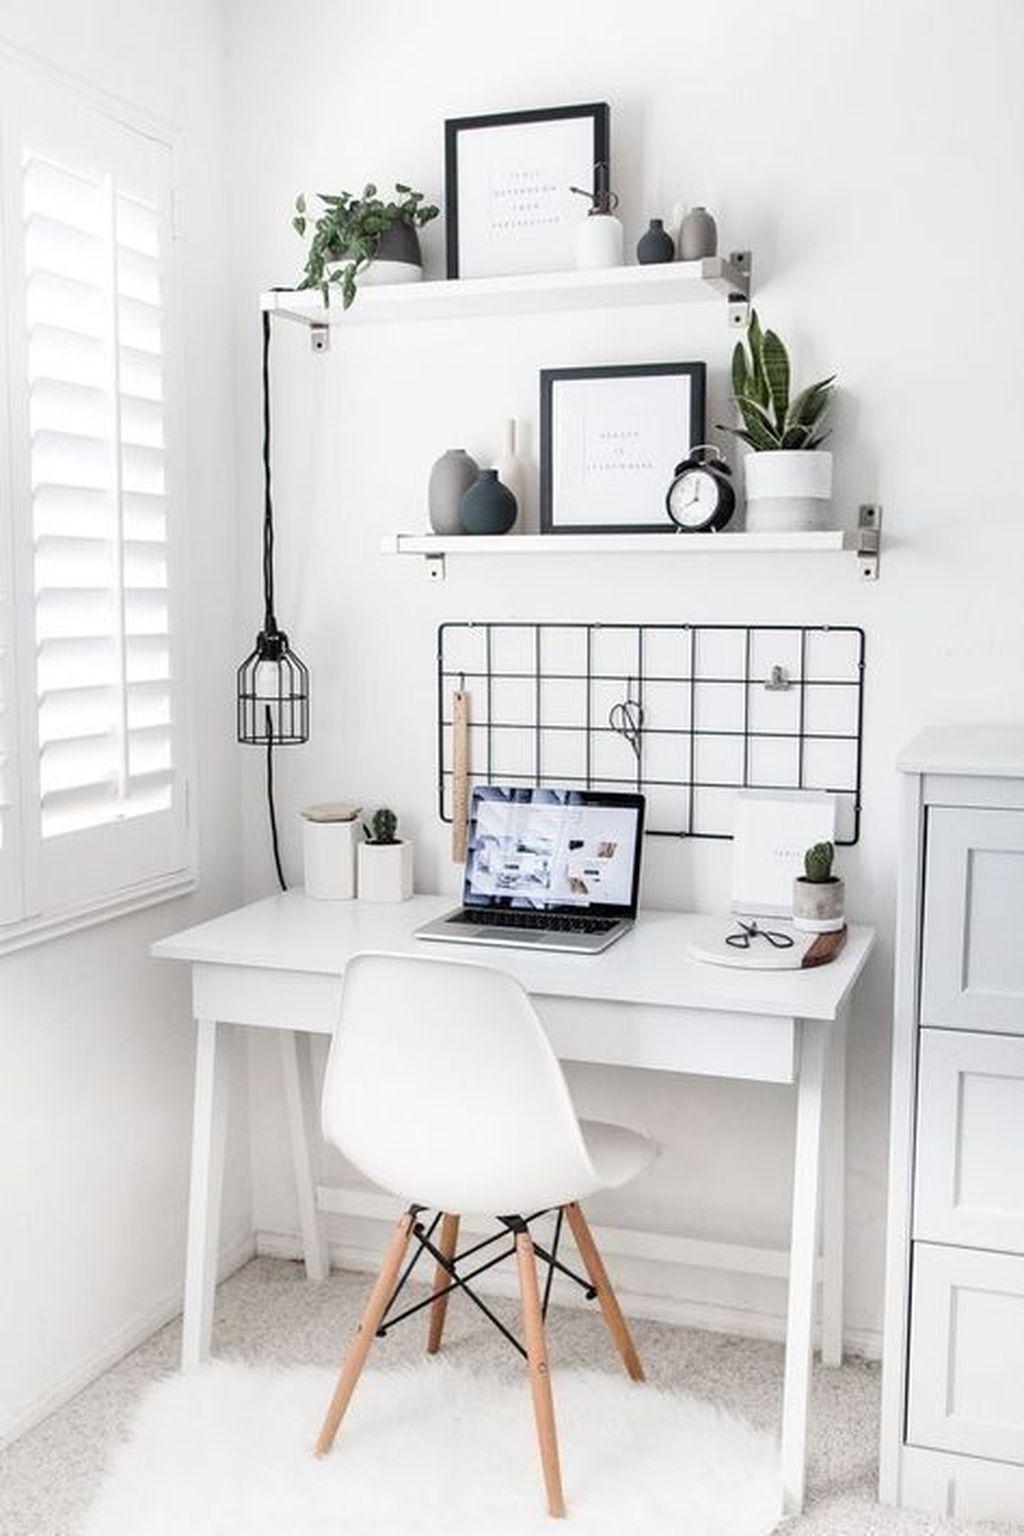 35 Elegant Scandinavian Interior Decorating Ideas For Small Spaces Minimalist Living Room Design Minimalist Home Decor Minimalist Living Room